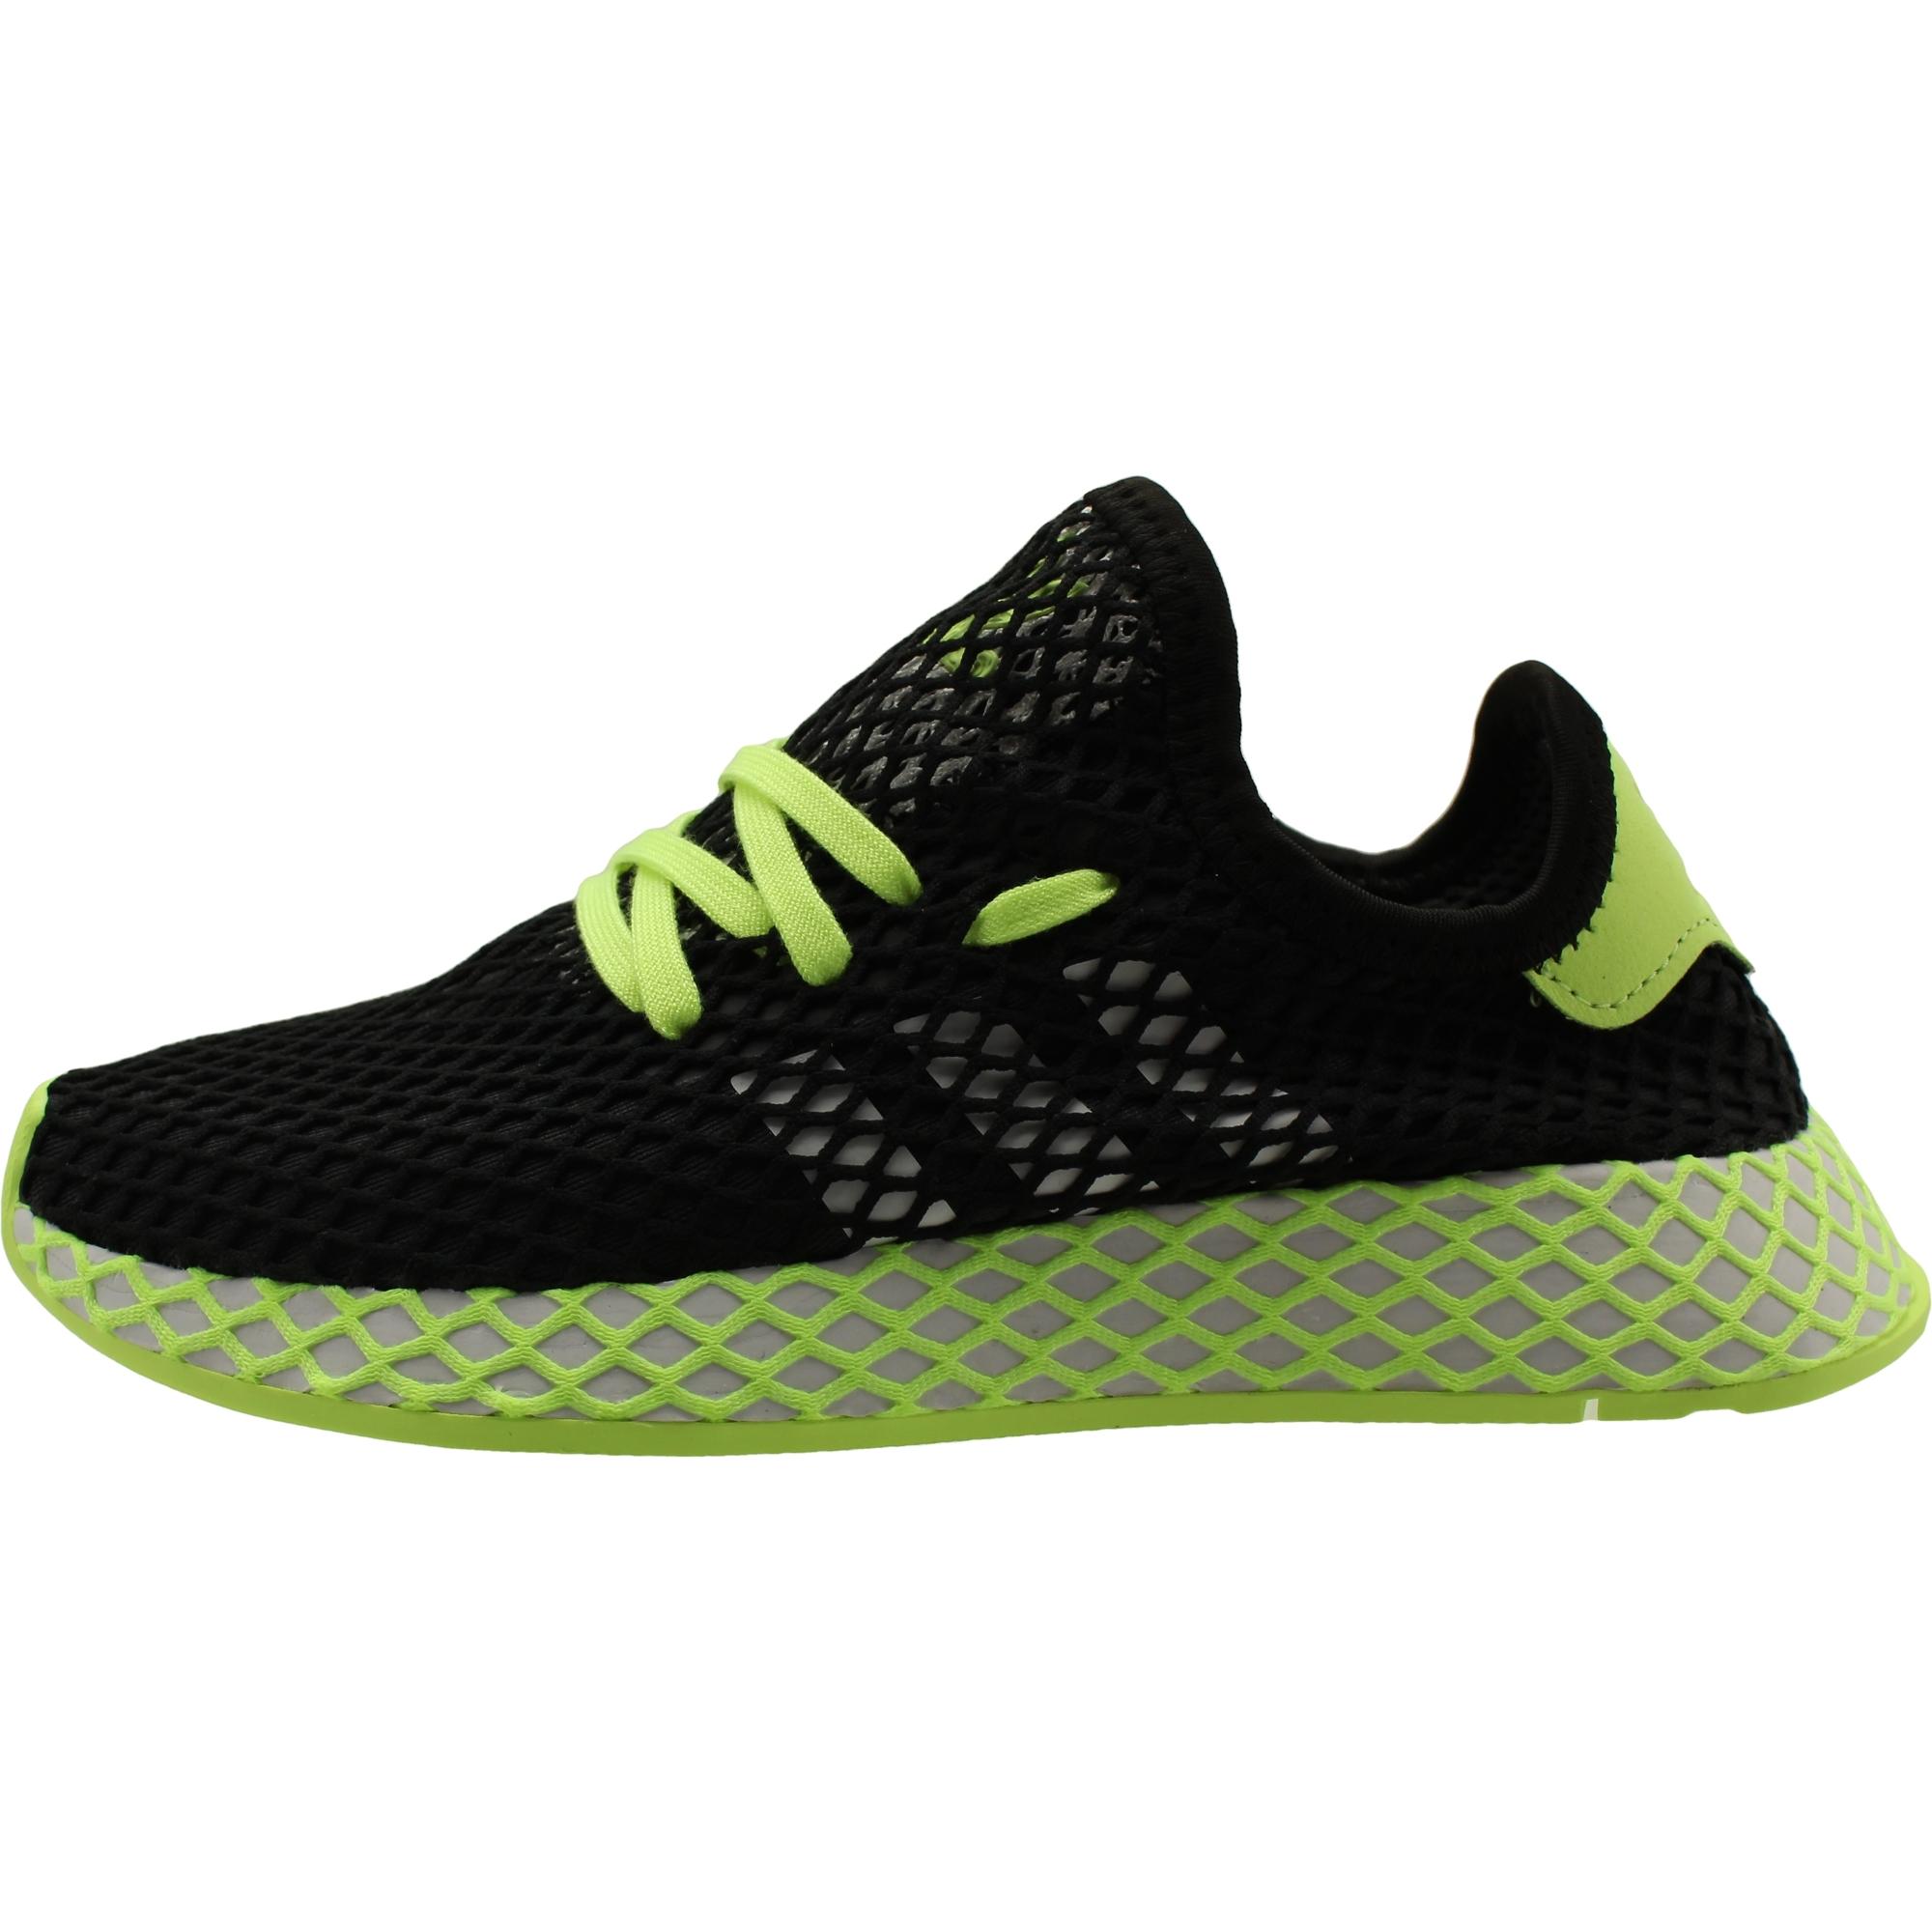 buying now latest discount wholesale outlet adidas Originals Deerupt Runner J Noir/Salut Res Jaune Engrener Jeunesse